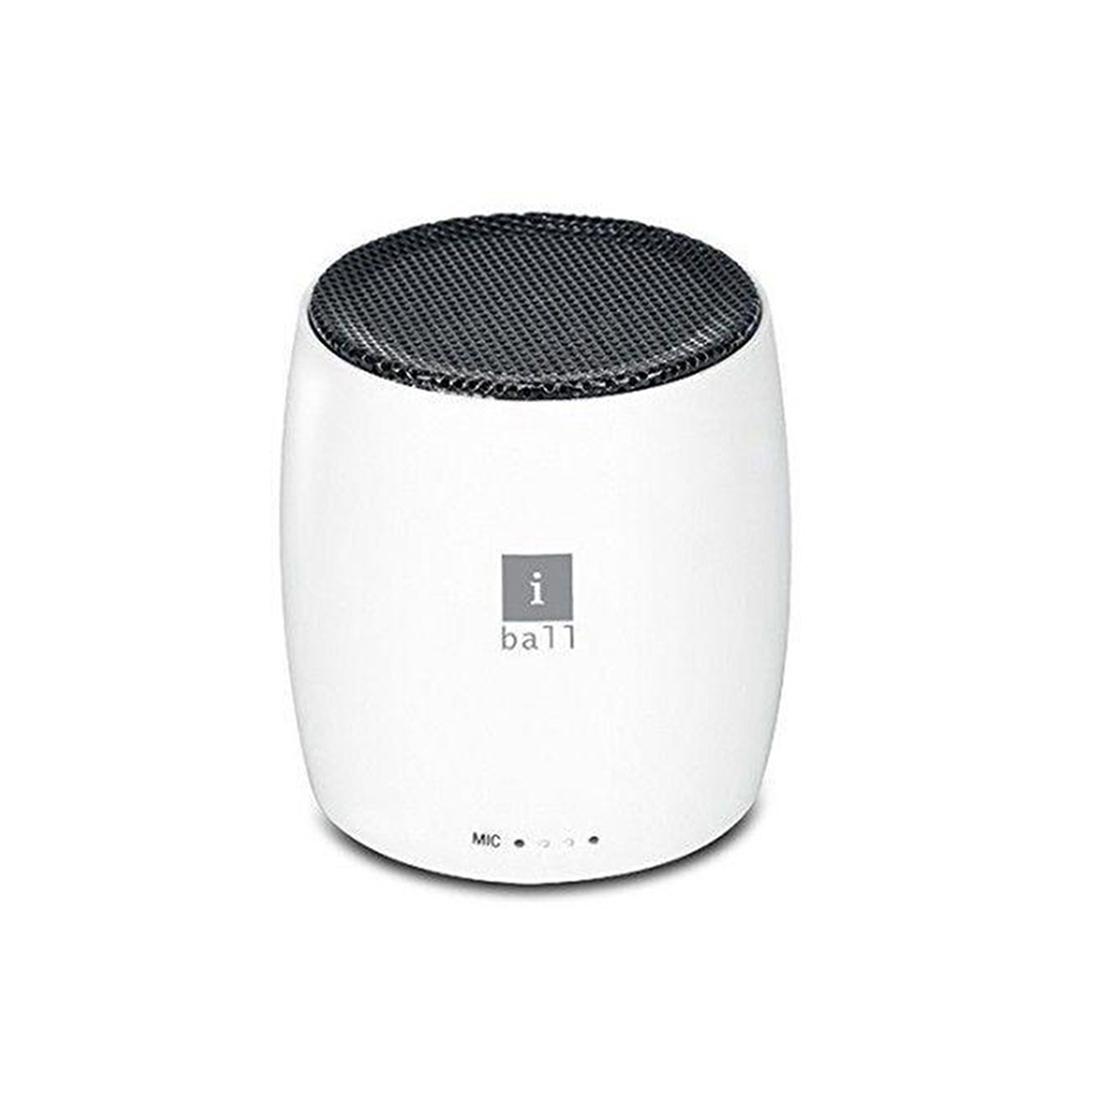 Boxed - Bluetooth Headphone